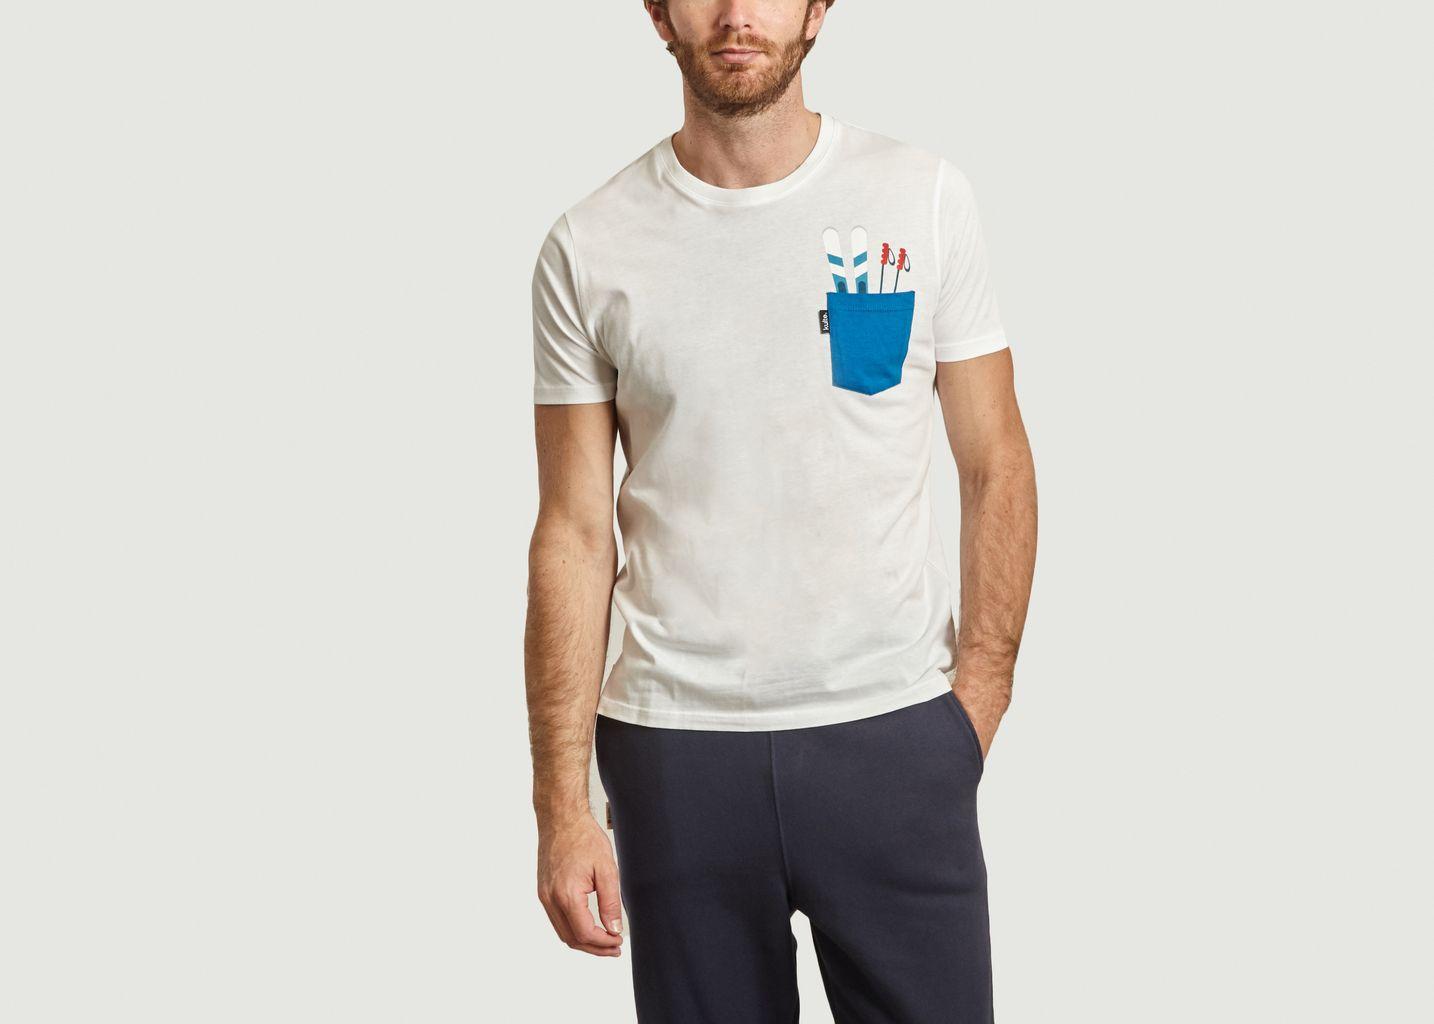 T-shirt collection ski - Kulte